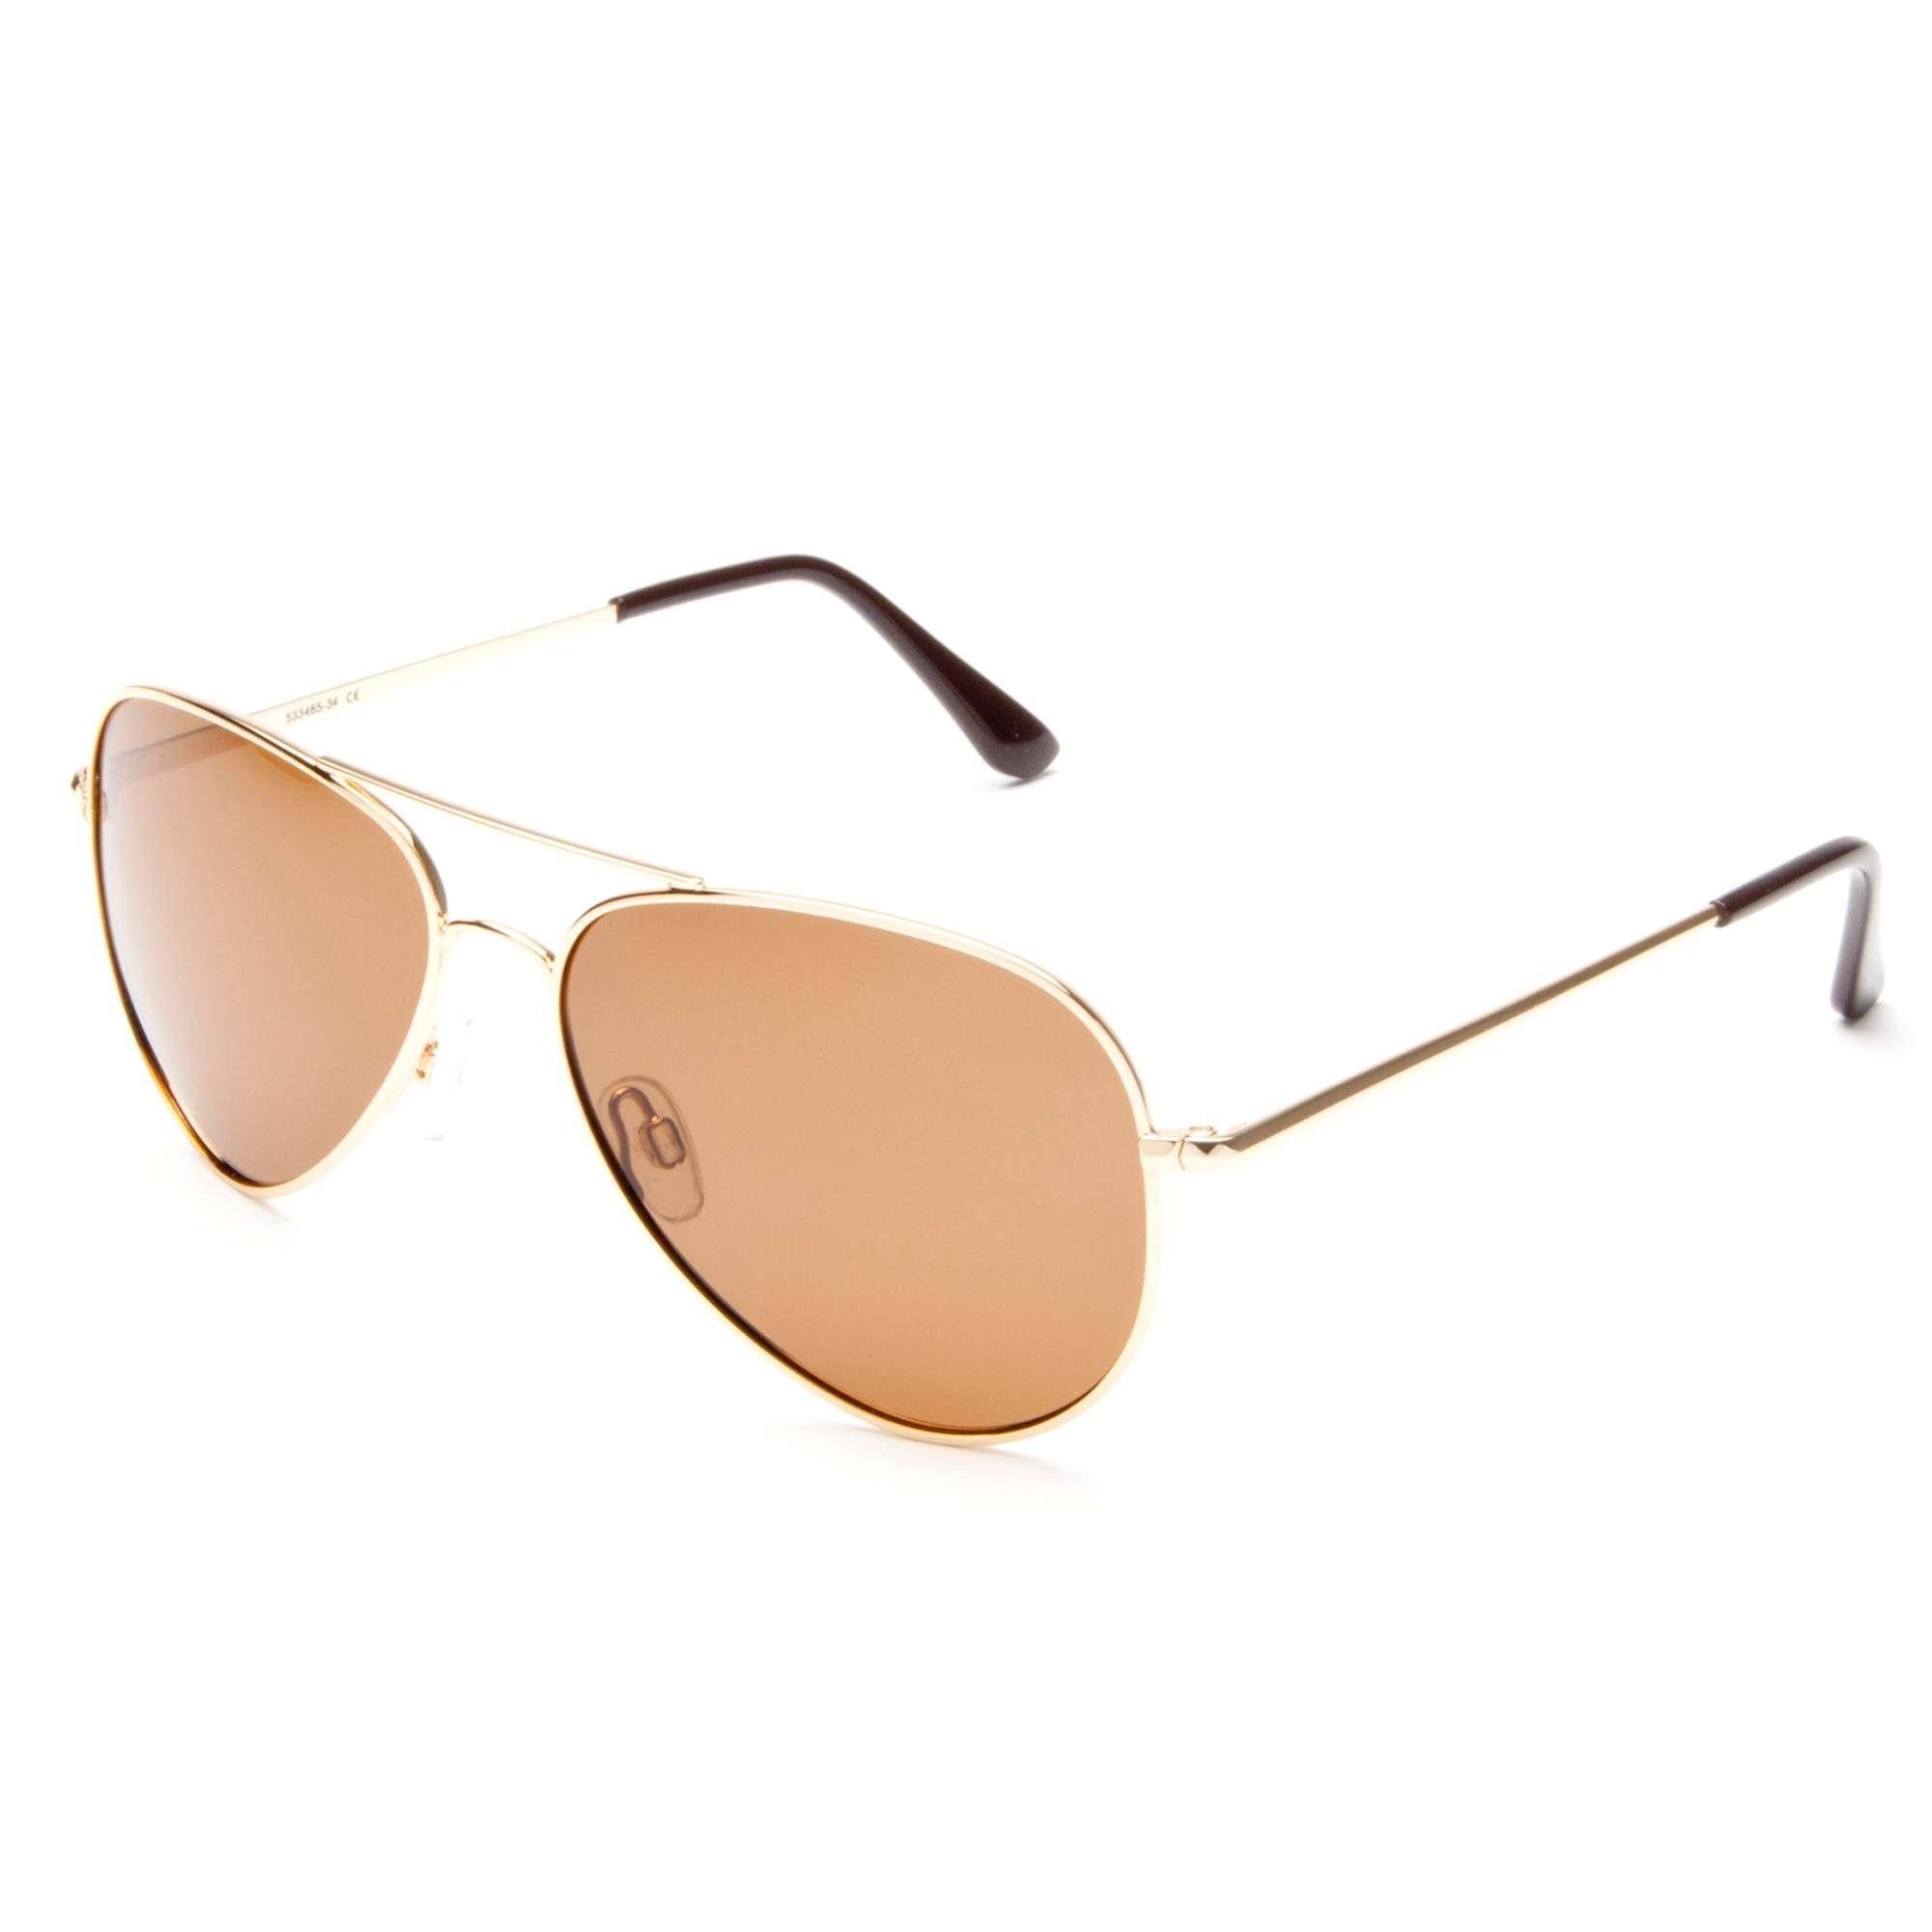 PETER STORM Women's Classic Aviator Polarised Sunglasses